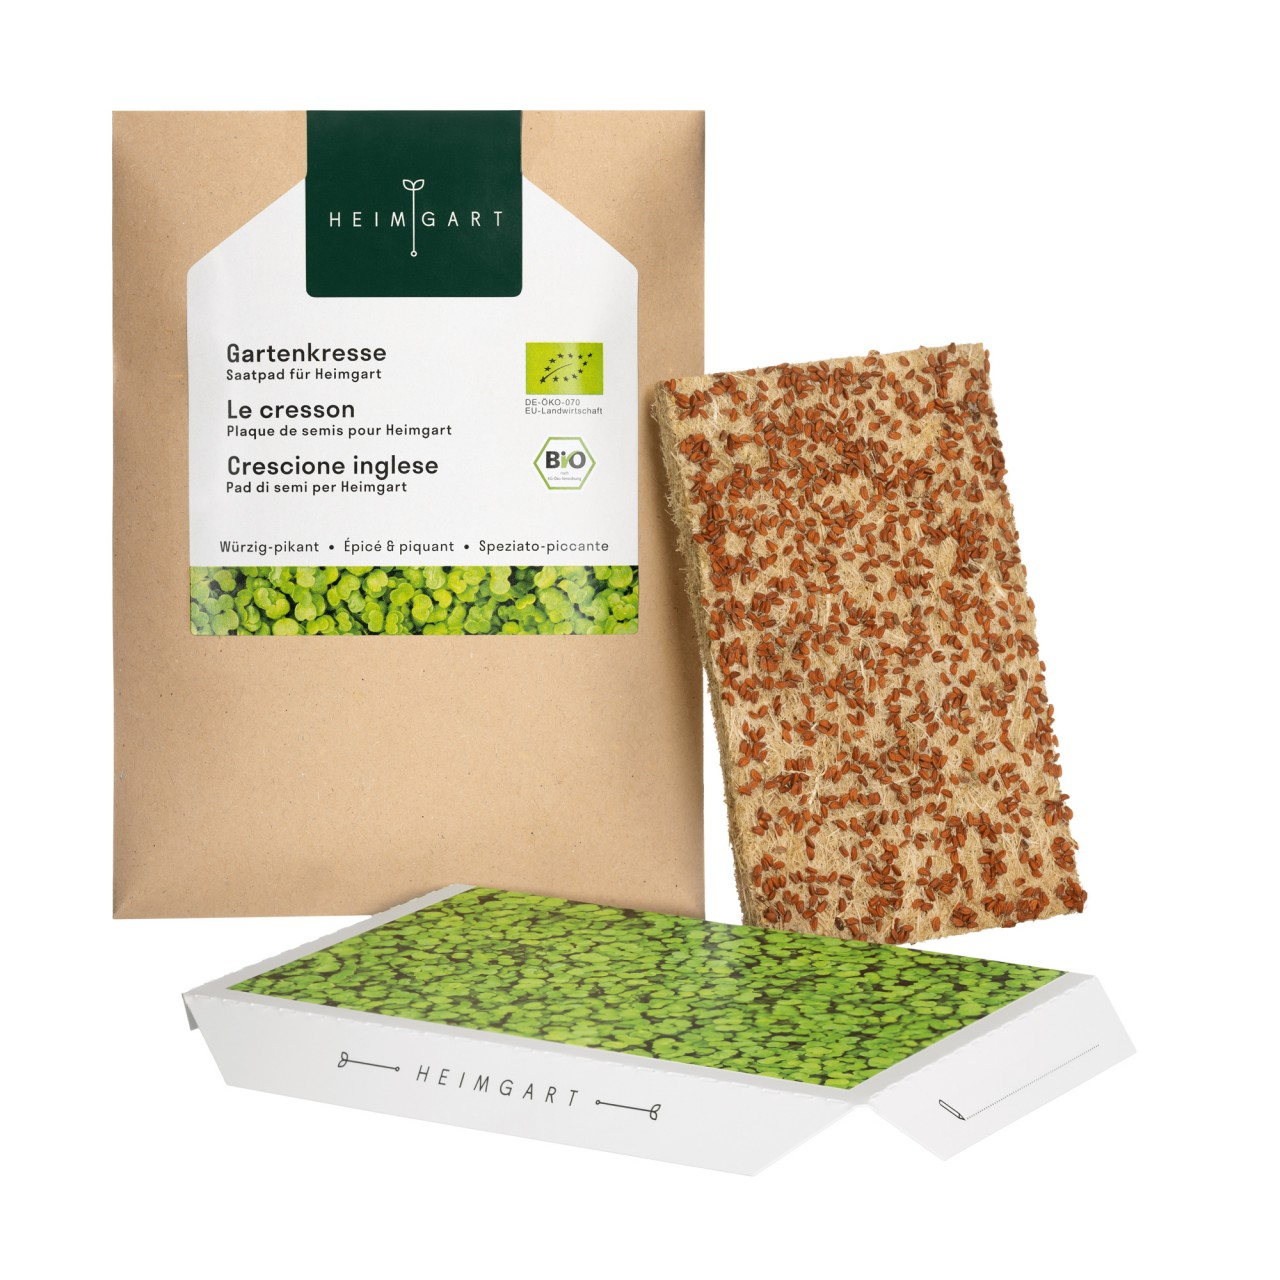 Microgreens Heimgart Bio Saatpad Gartenkresse